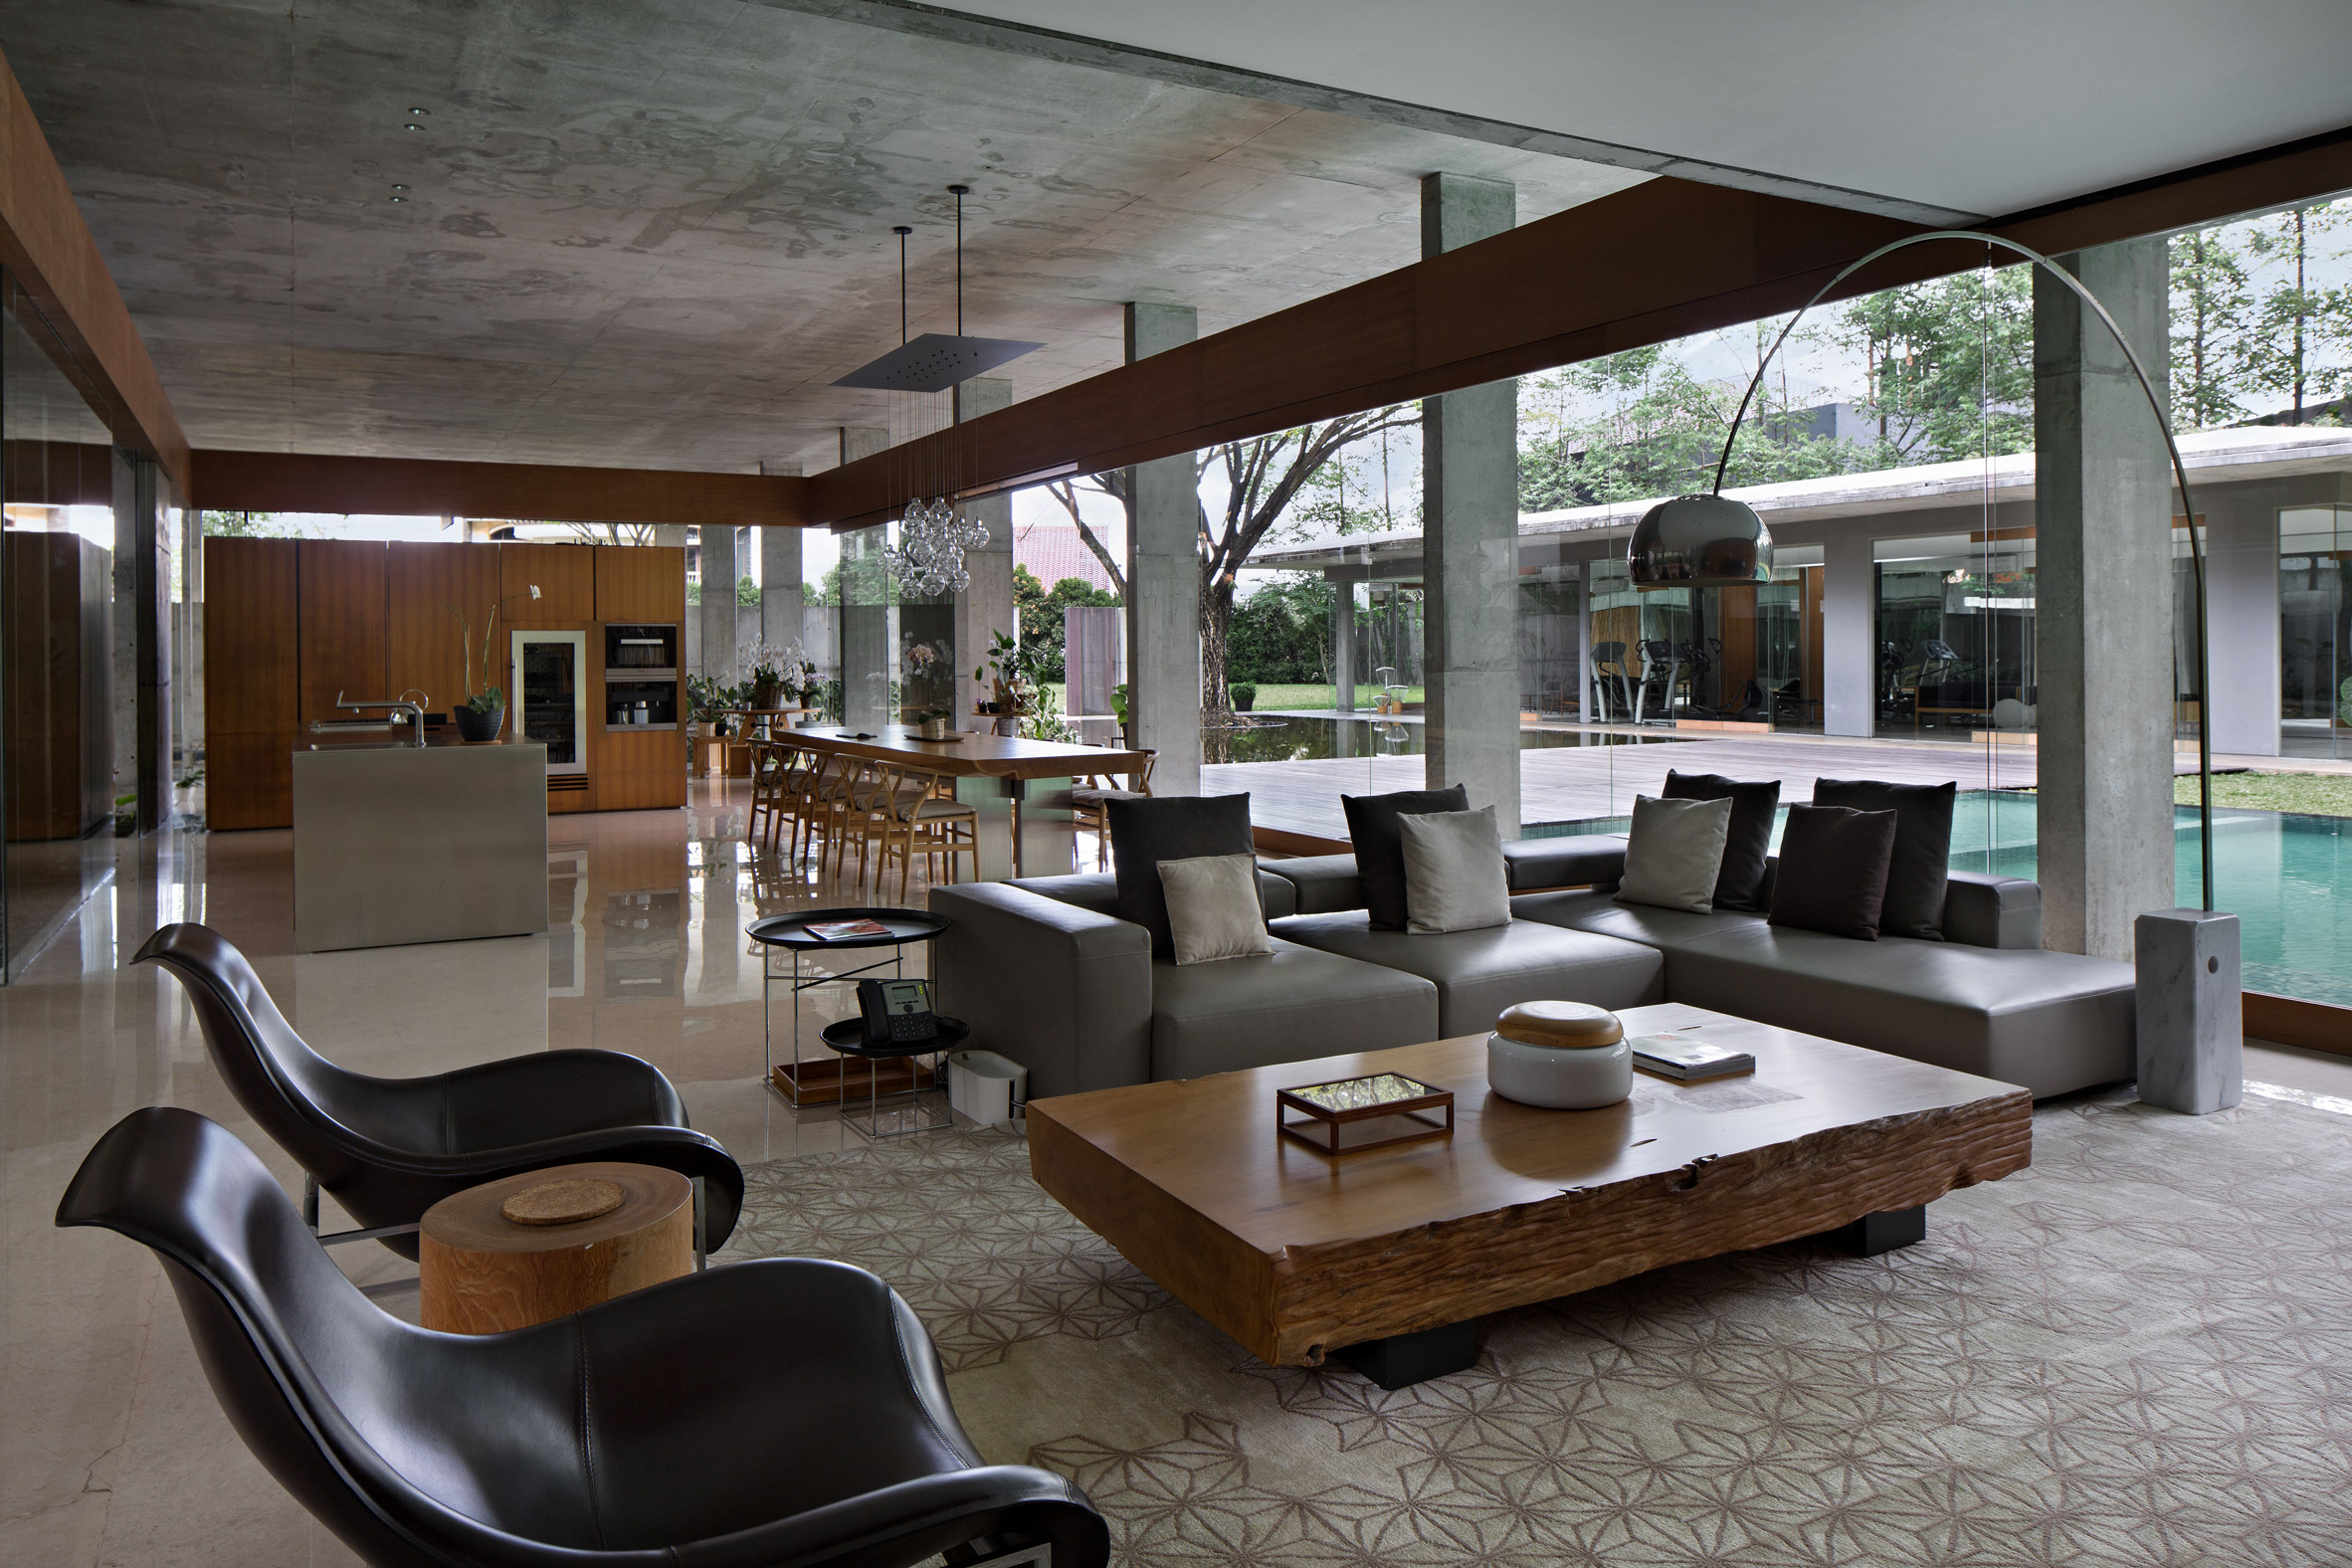 Interior of concrete house